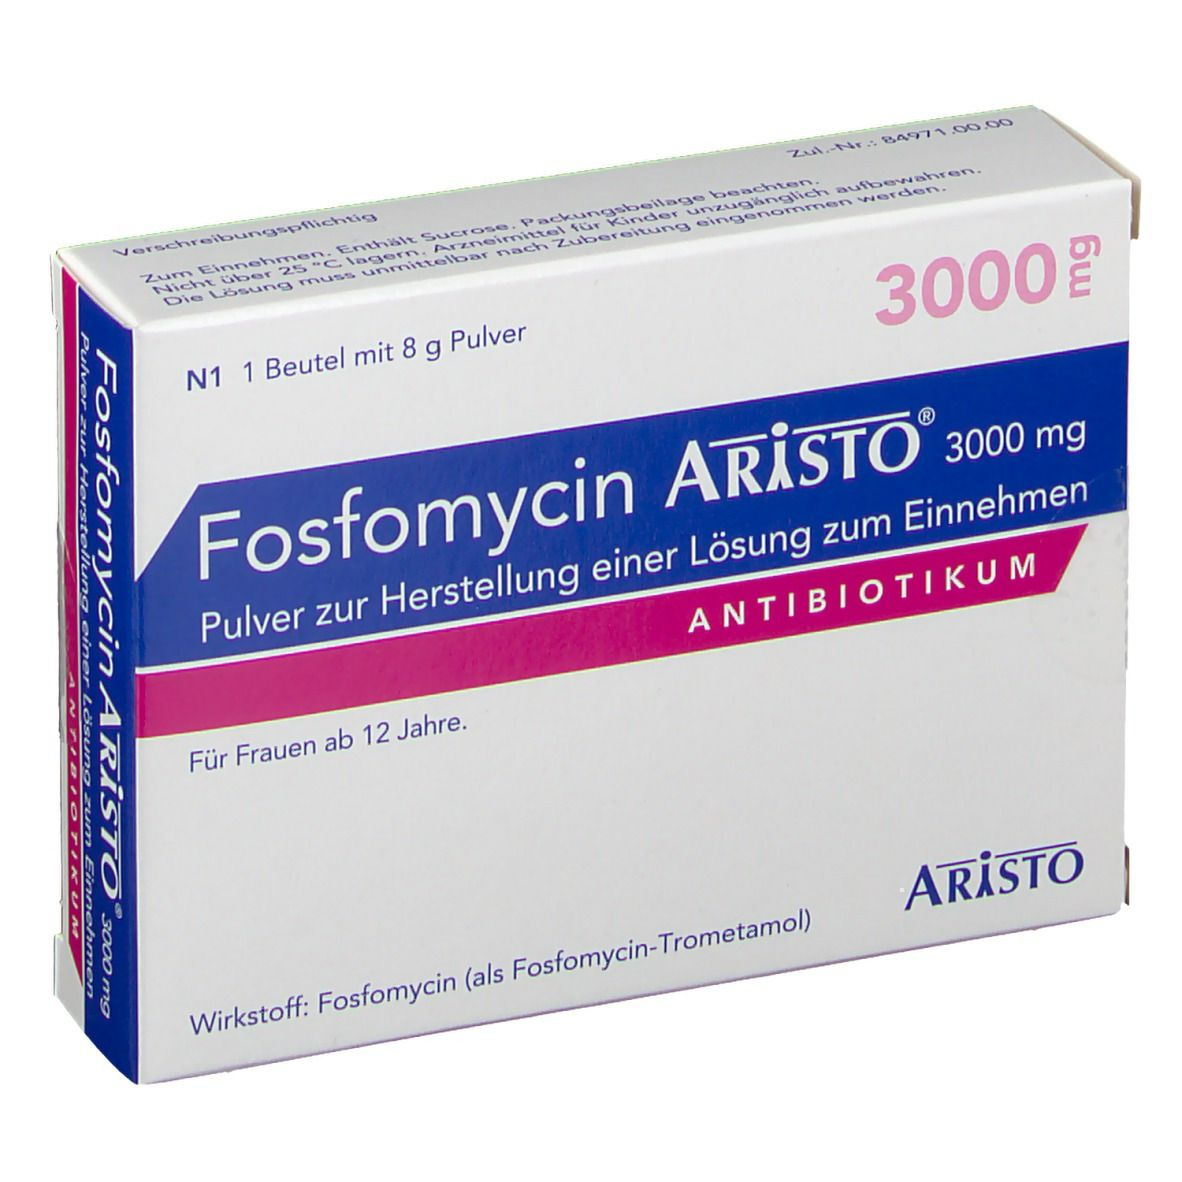 Fosfomycin aristo 3000 mg pulver